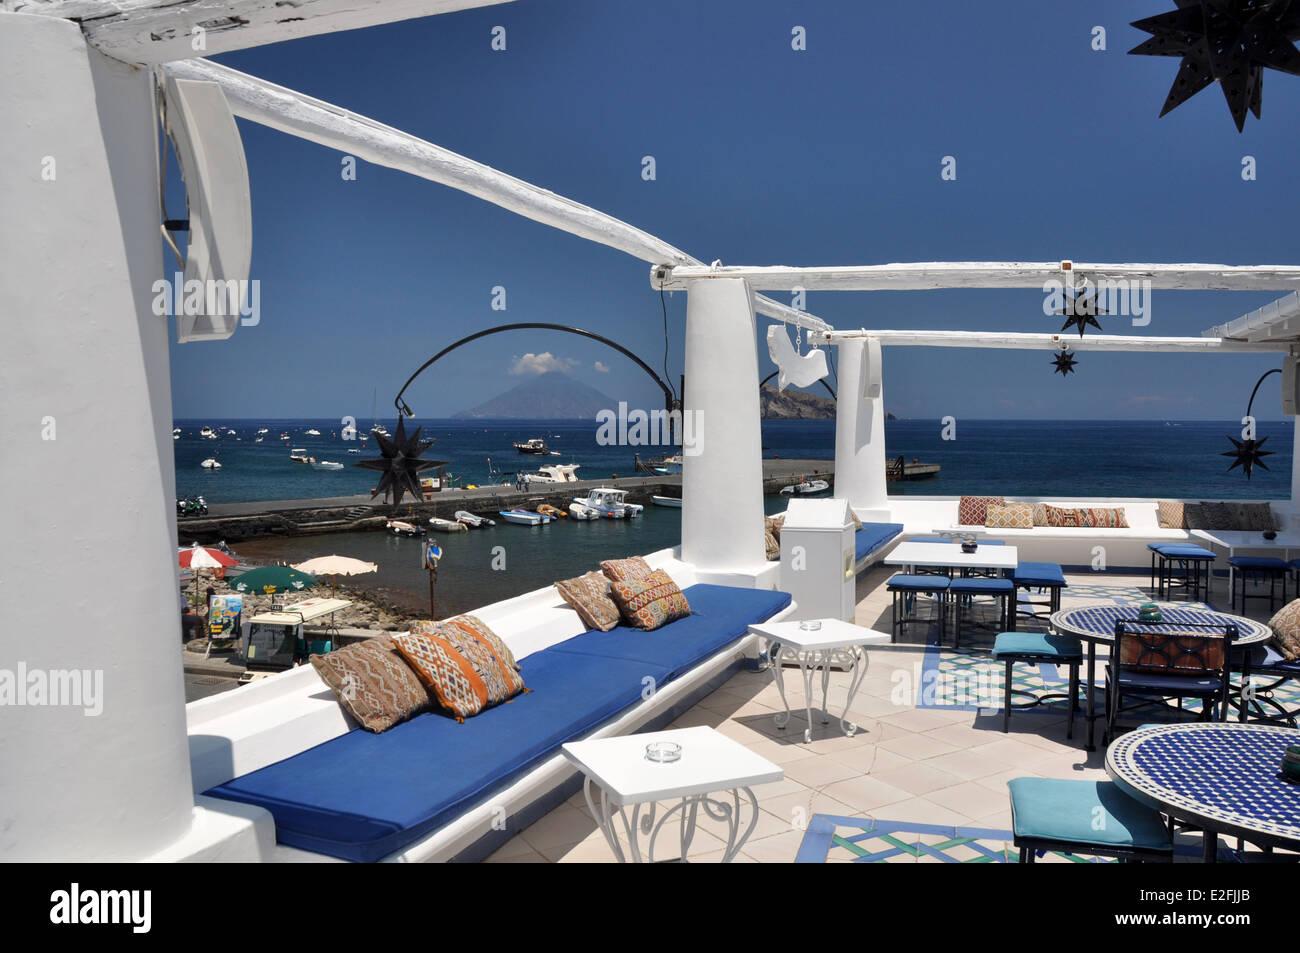 aeolian Islands, Panarea, Lisca Bianca Lounge bar, Stromboli in the background - Stock Image